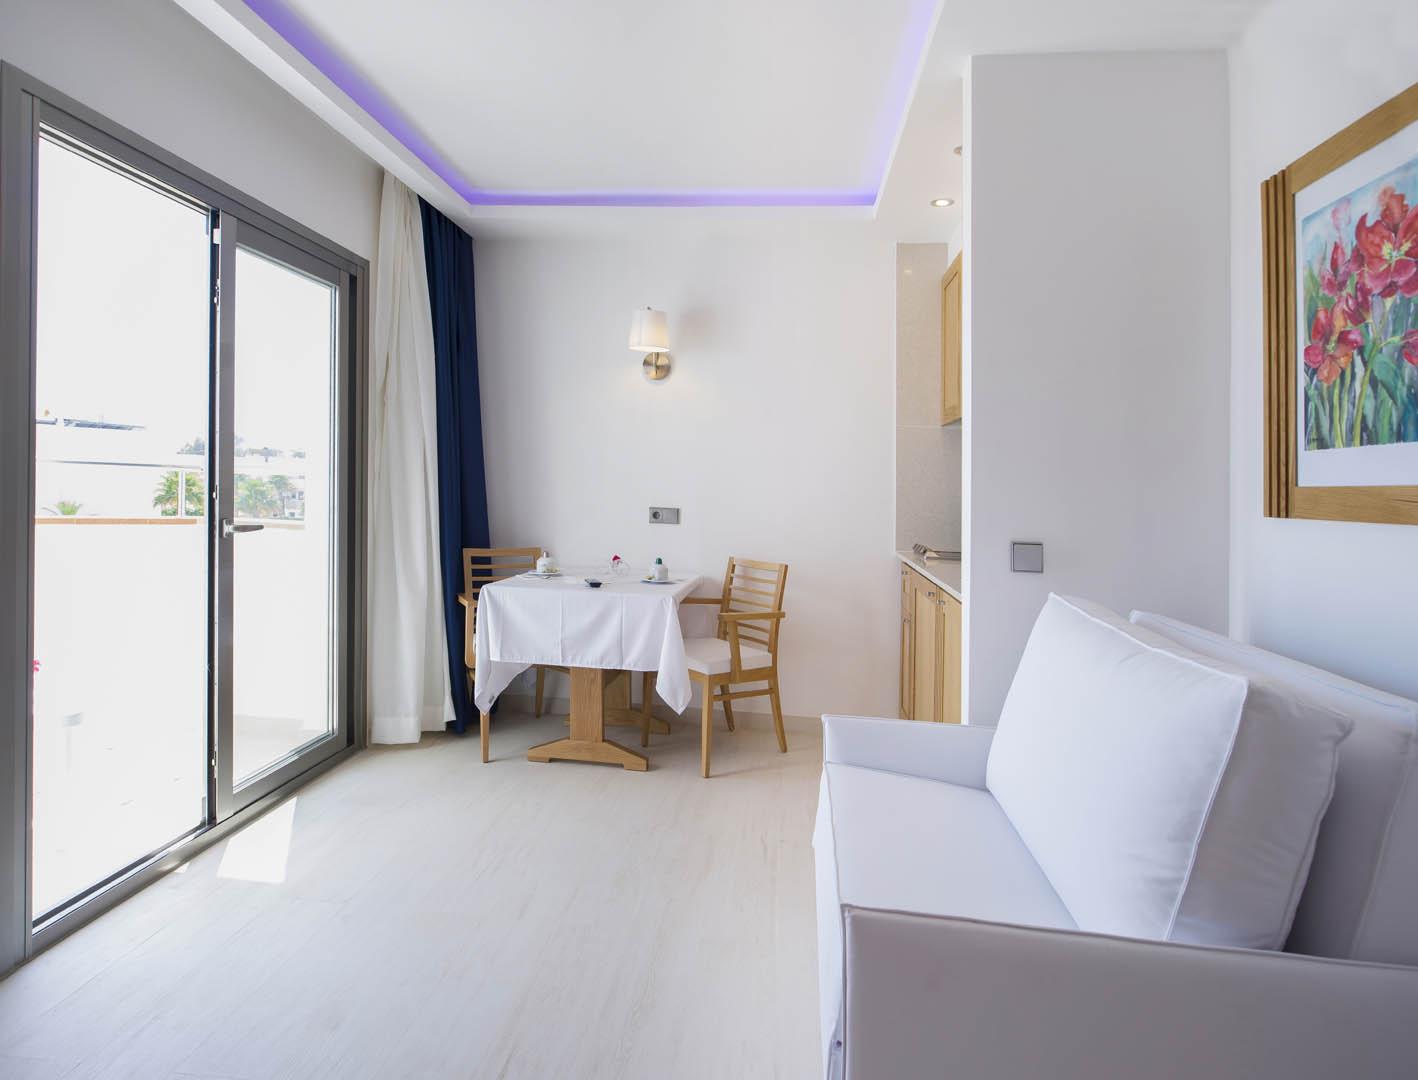 https://www.apartamentosbonsol-ibiza.com/wp-content/uploads/2016/02/09.jpg